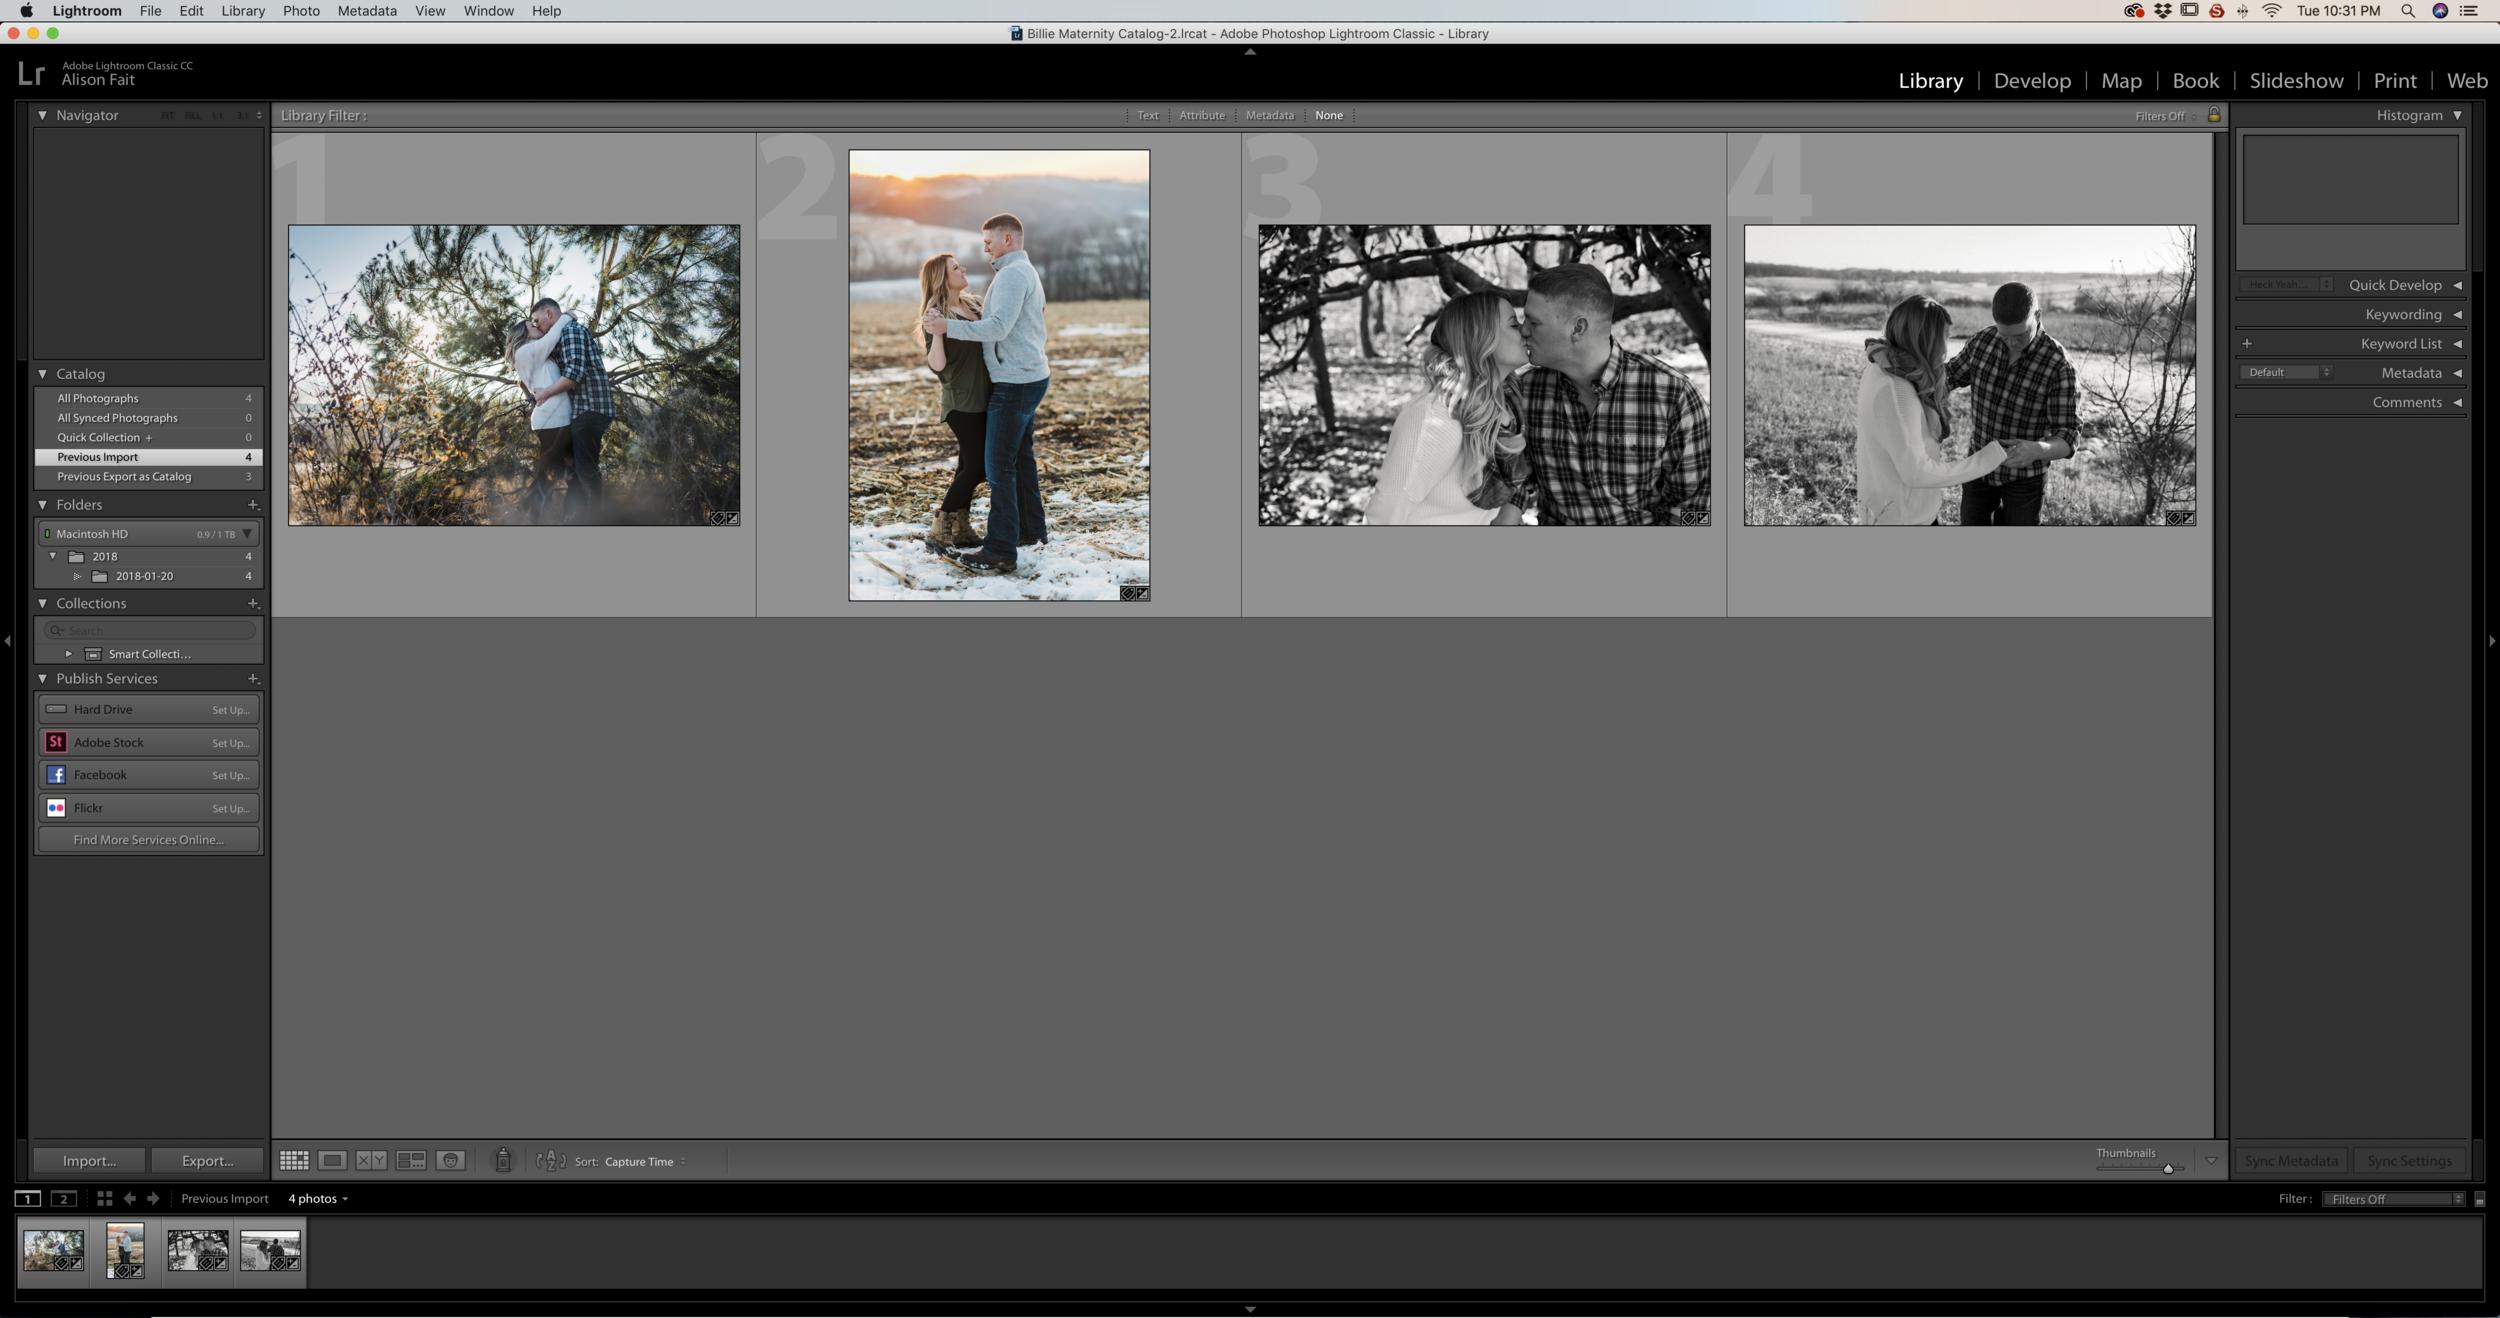 Step 1: Import Photos